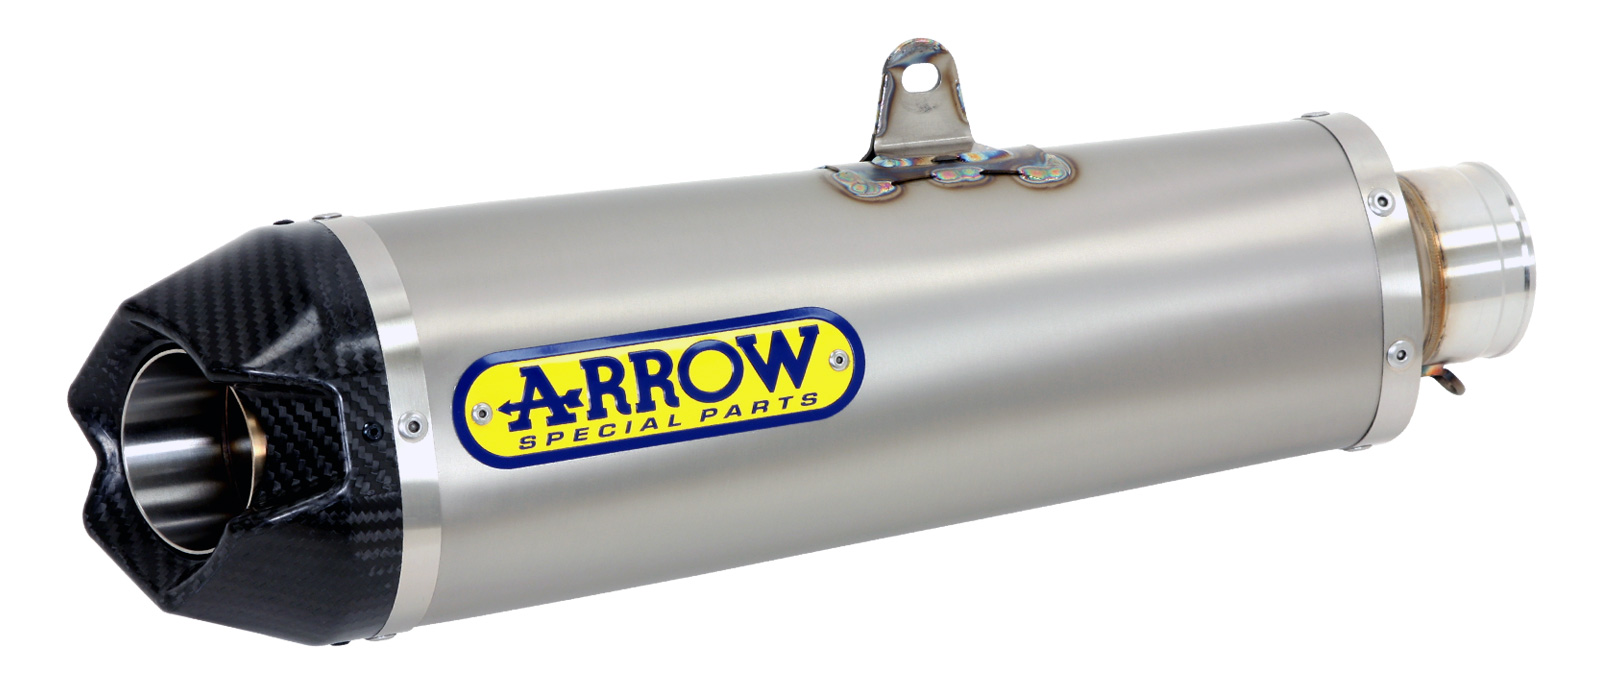 ARROW Auspuff WORKS für BMW S1000R / RR 2009-2016, Titan